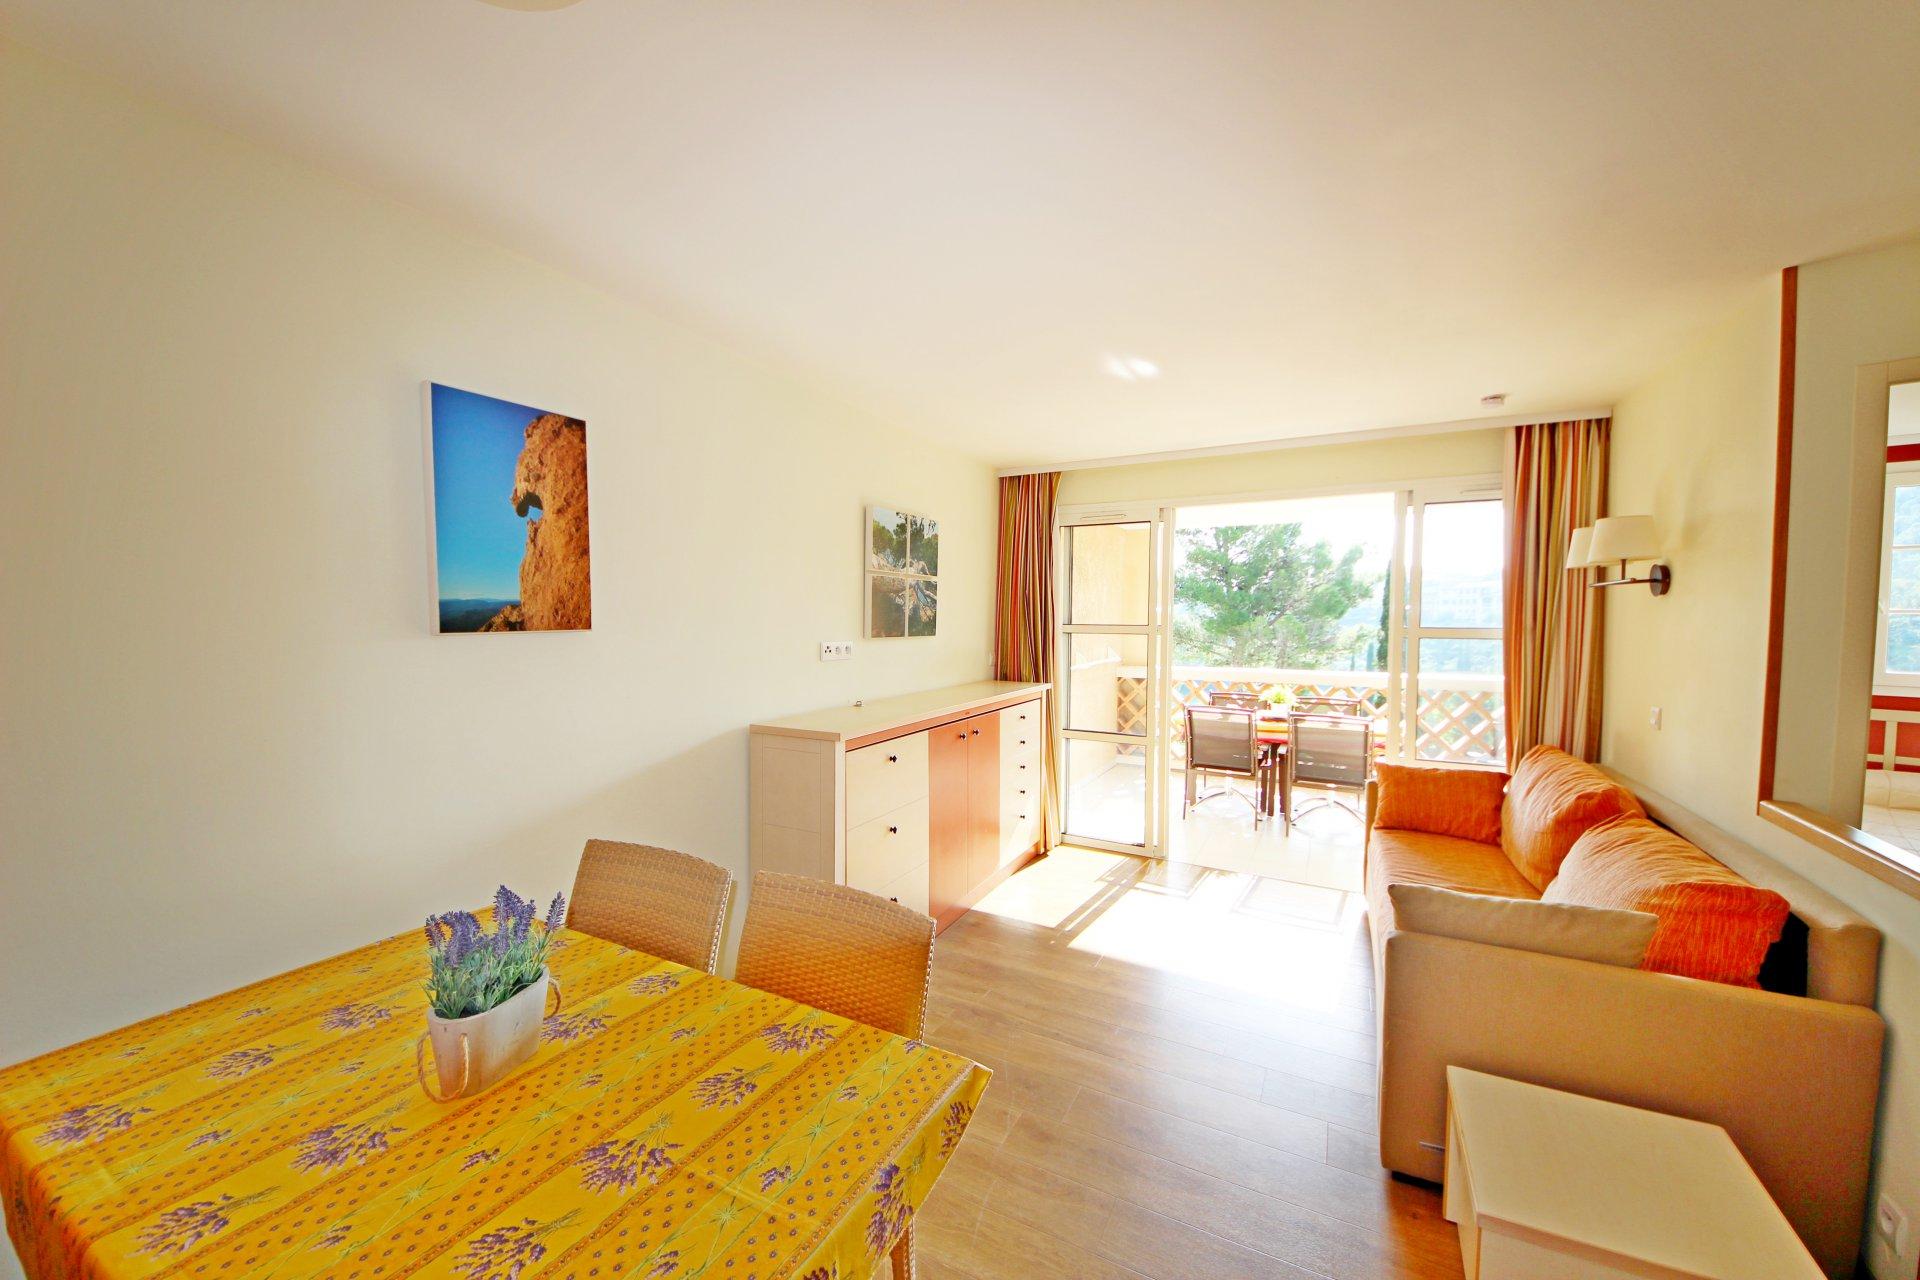 The living room of the Cap Esterel apartment